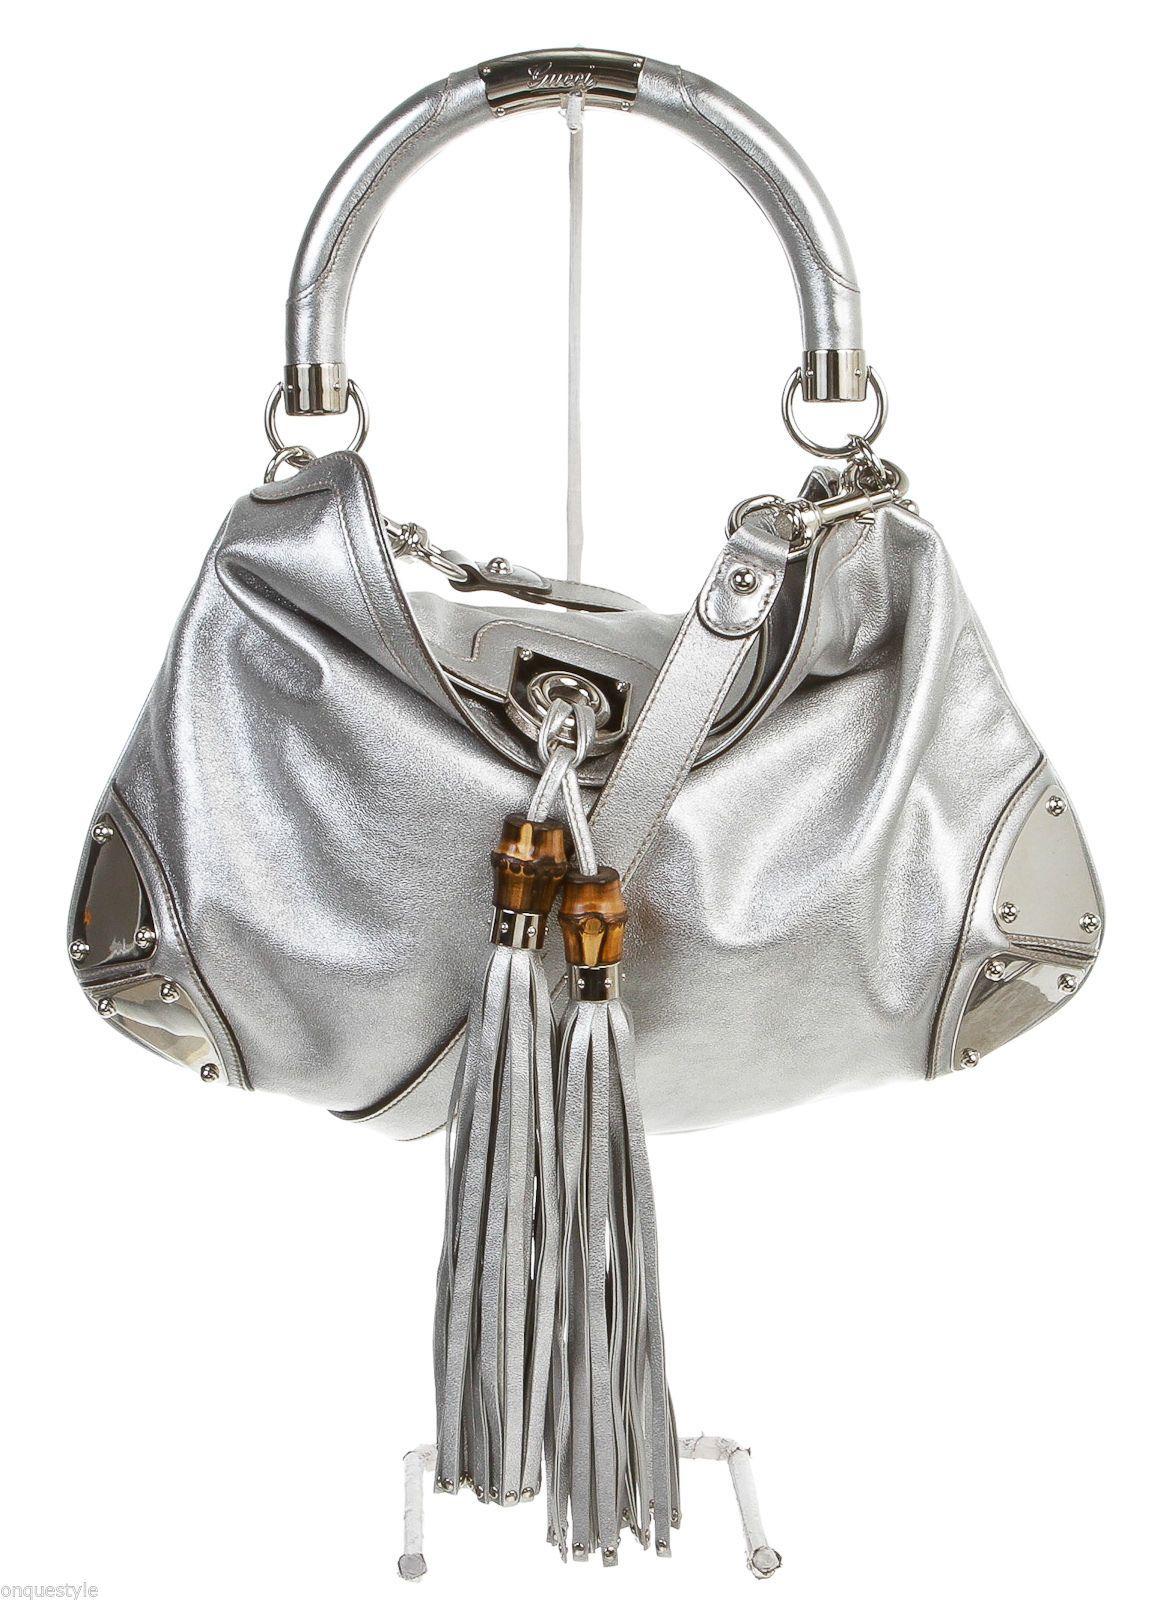 cdc04c8d766625 Gucci Silver Leather Babouska Indy Hobo Handbag | g u c c i | Hobo ...